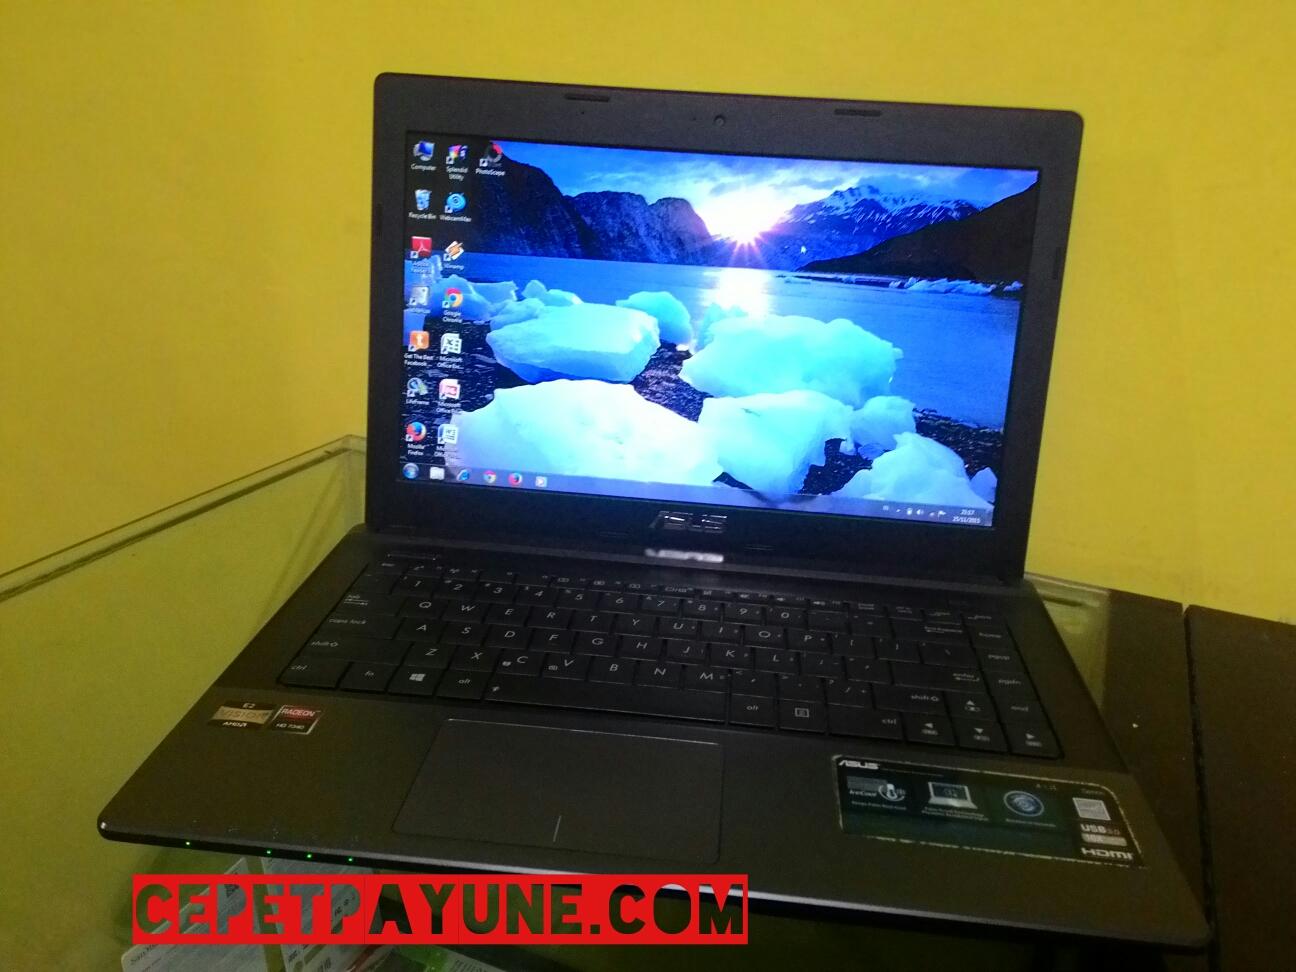 Harga Jual Laptop Asus Amd E2 Bekas